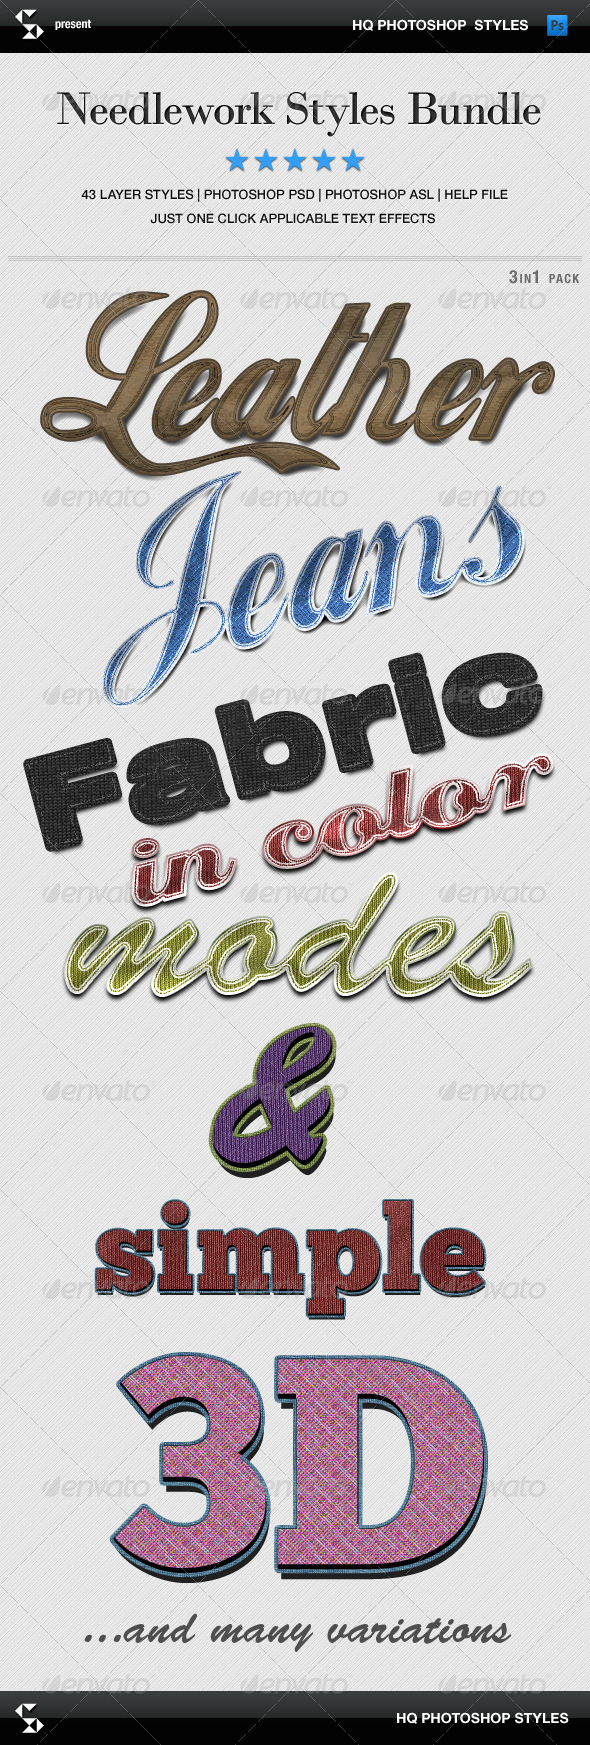 GraphicRiver Needlework Styles Bundle Denim Leather Fabric 8083632